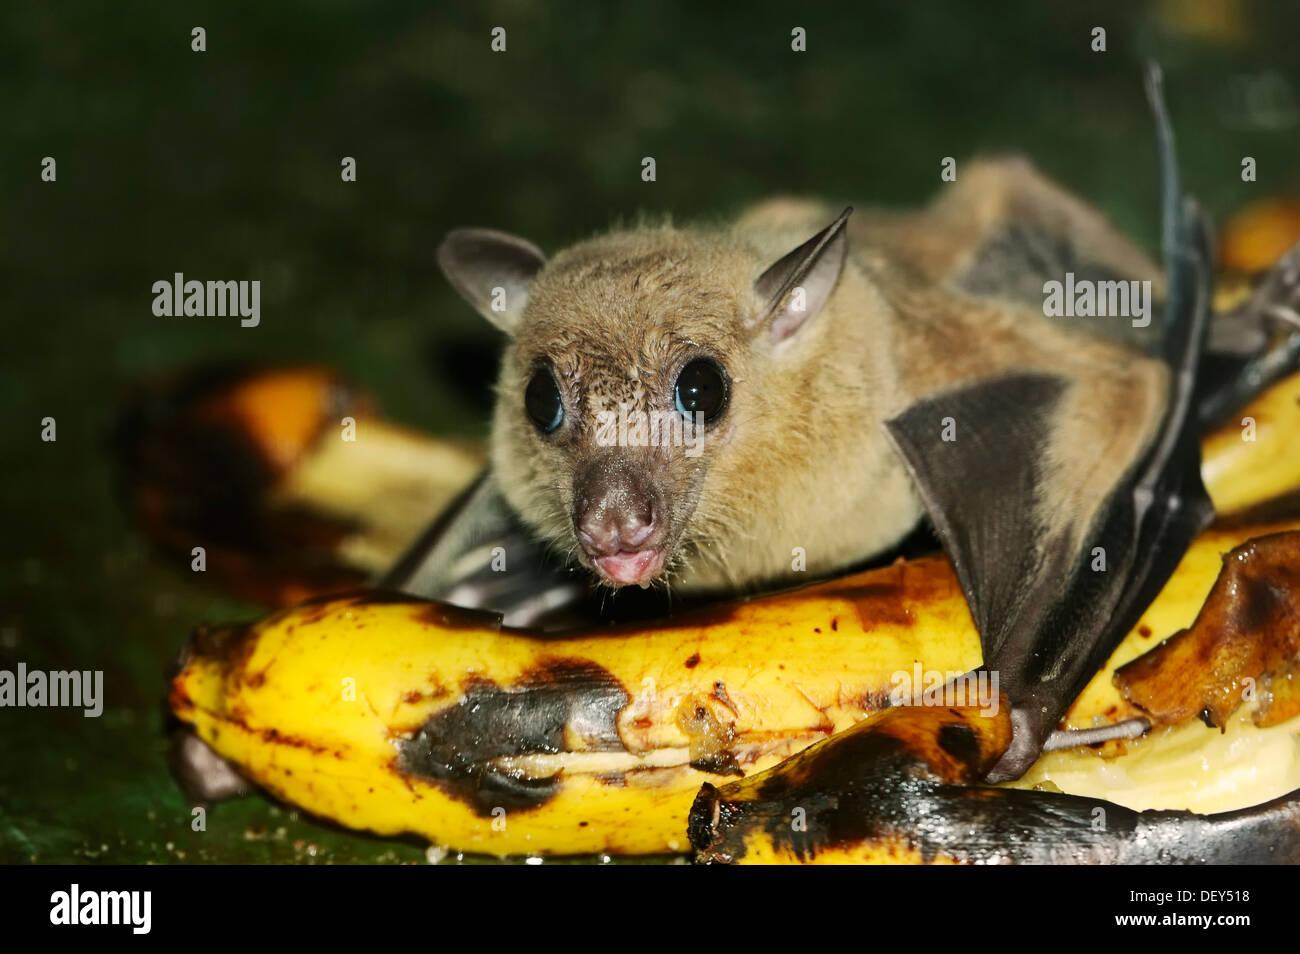 Egyptian fruit bat or Egyptian rousette (Rousettus aegyptiacus), male, feeding on a banana, native to Africa and Stock Photo